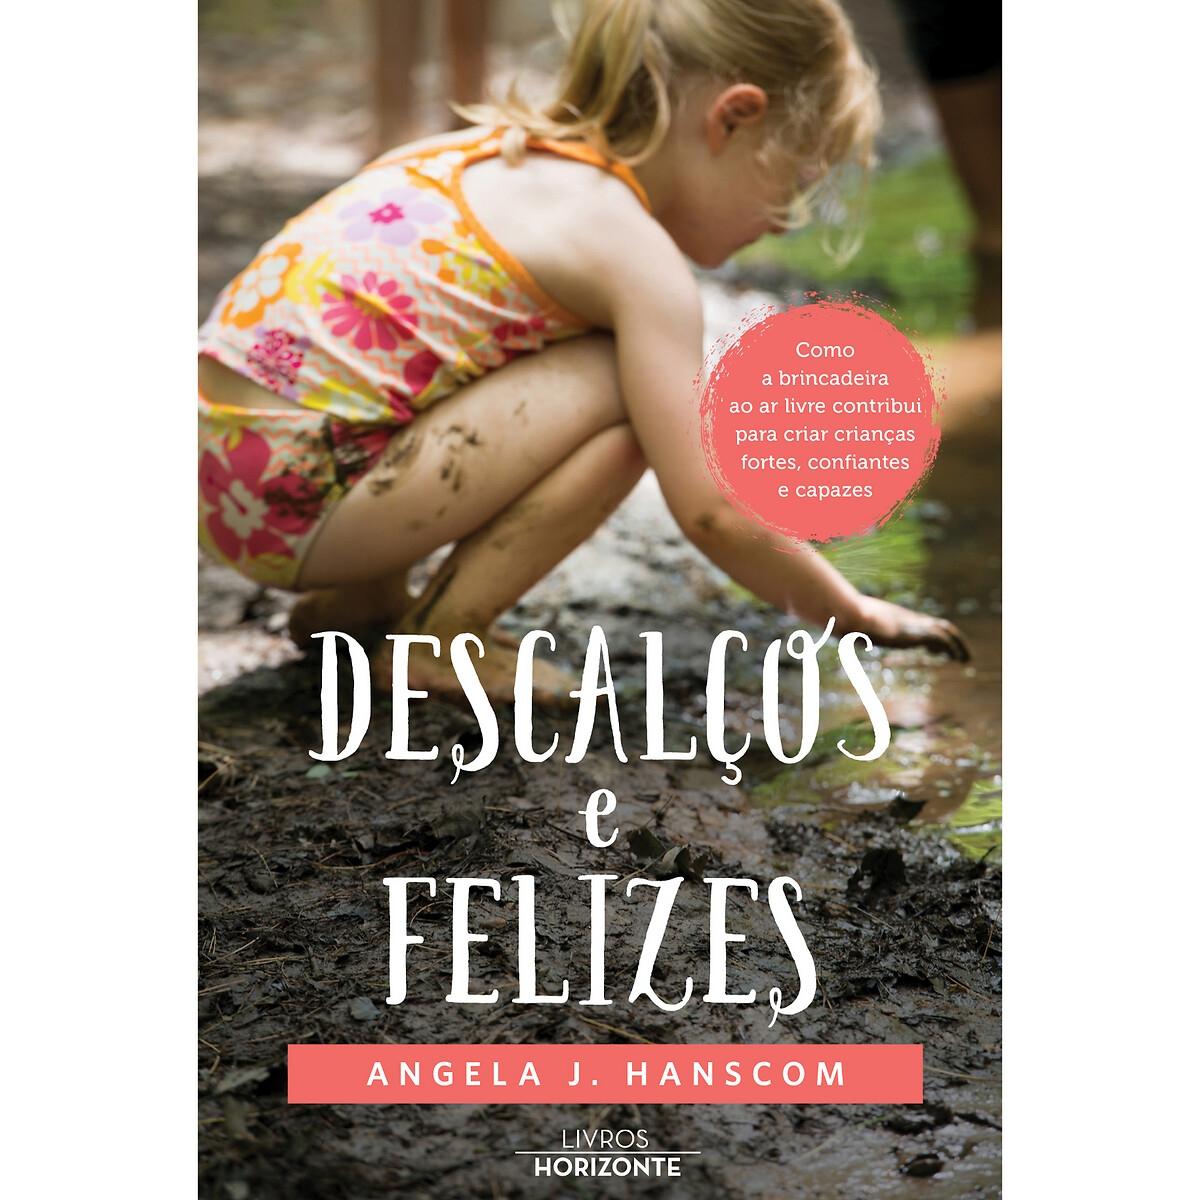 LIVROS HORIZONTE - Livros Horizonte Livro Descalços e Felizes